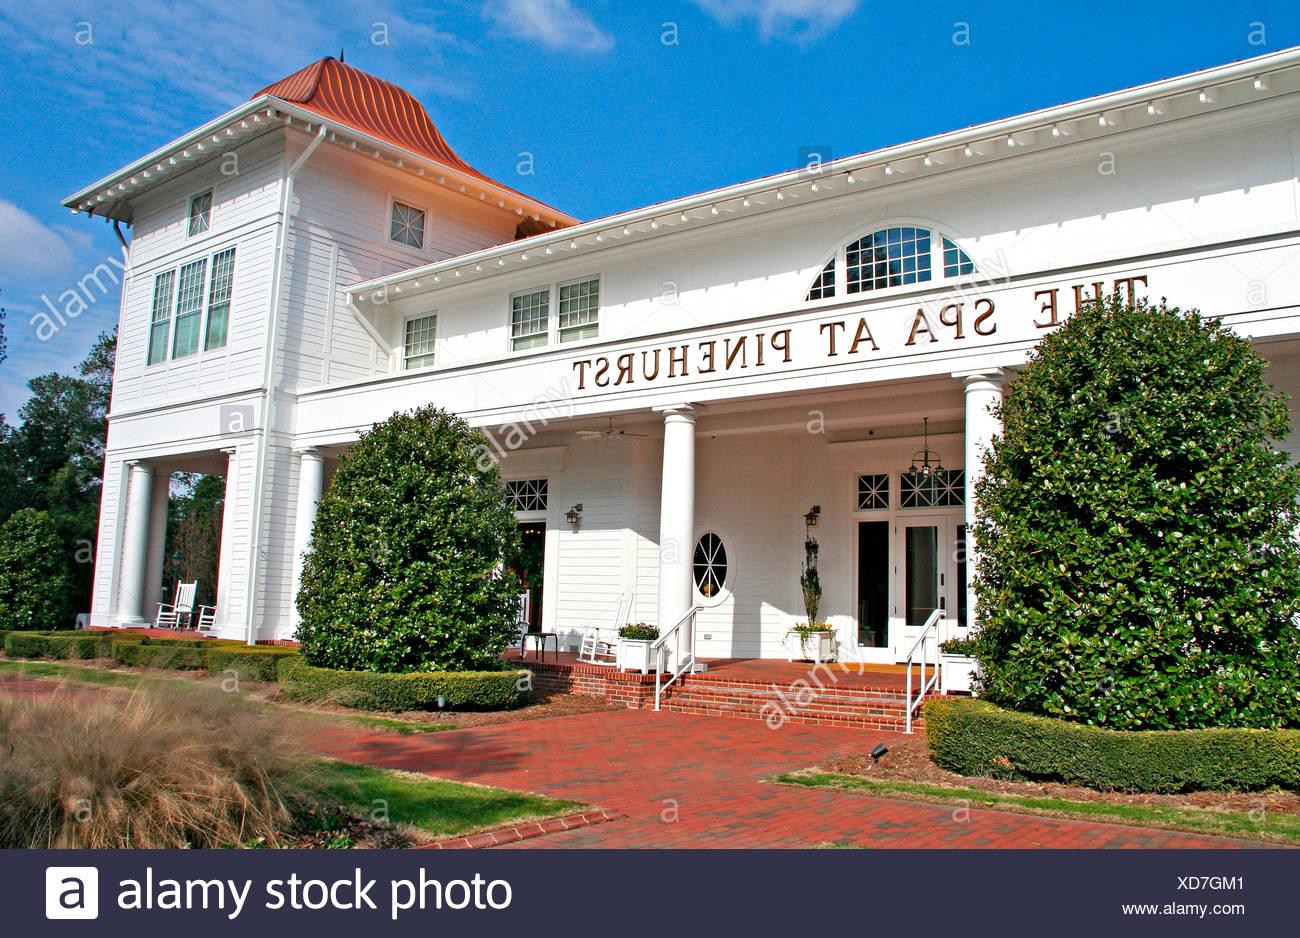 Pinehurst Spa and resort entrance North Carolina - Stock Image